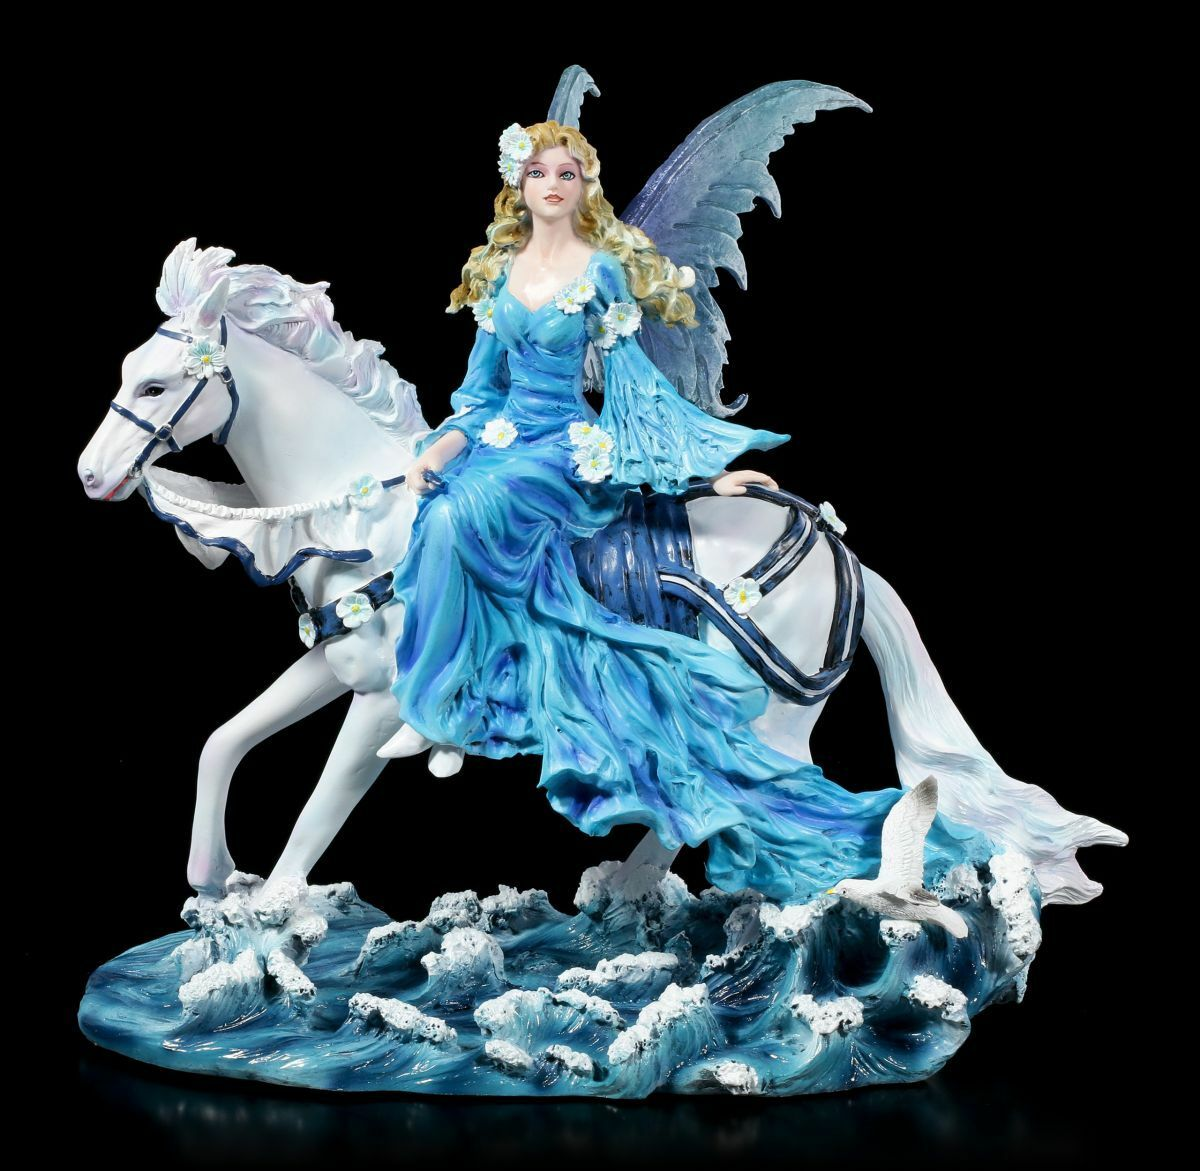 Figura Elfos con Caballo - Euphoria By Nene Thomas - Fantasy Hada Unicornio